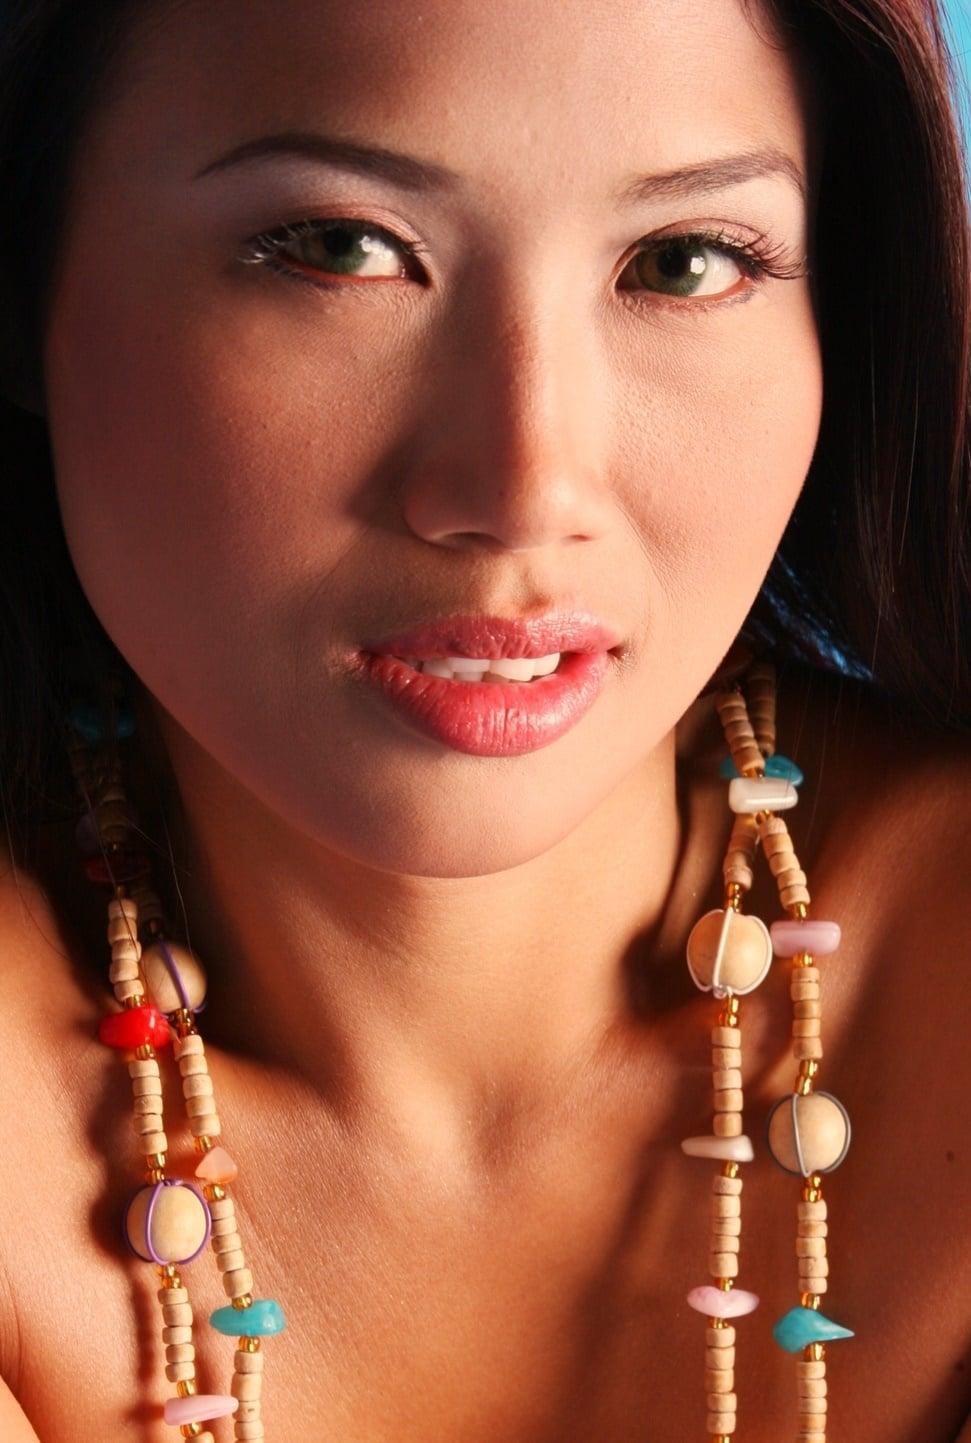 Yvette Yzon